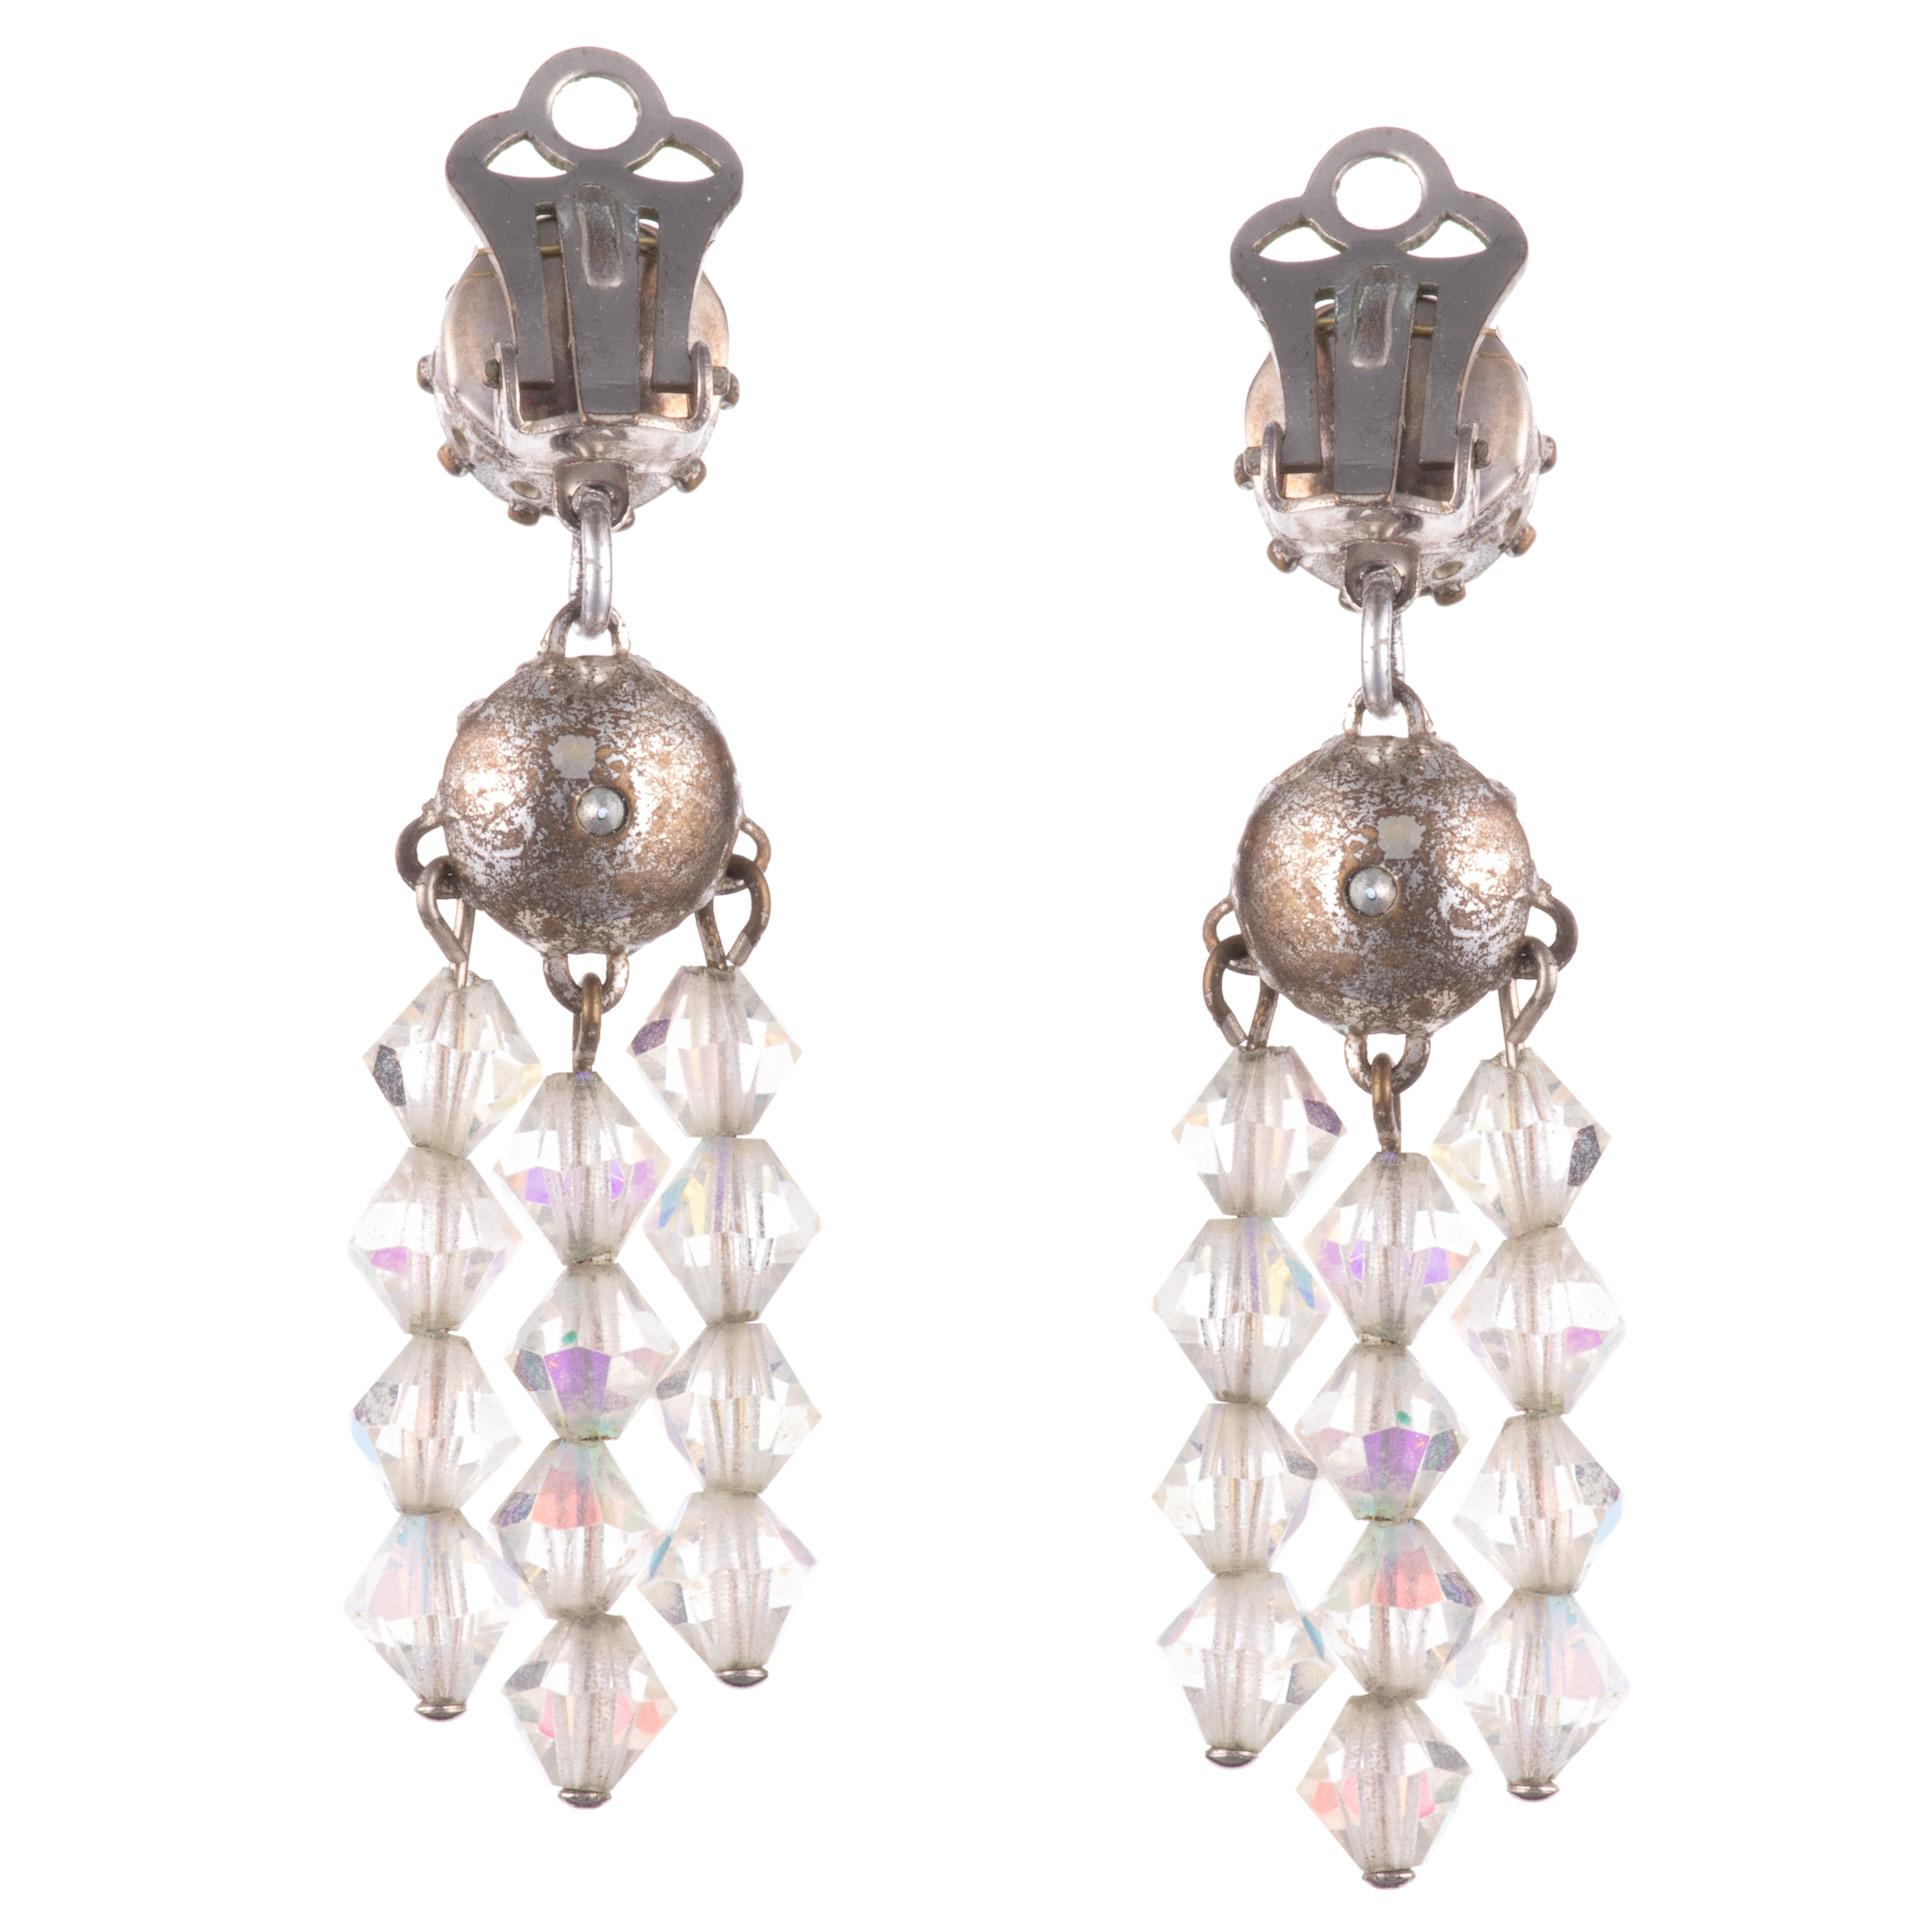 1960s Iridescent Rhinestone Earrings - Image 2 of 3